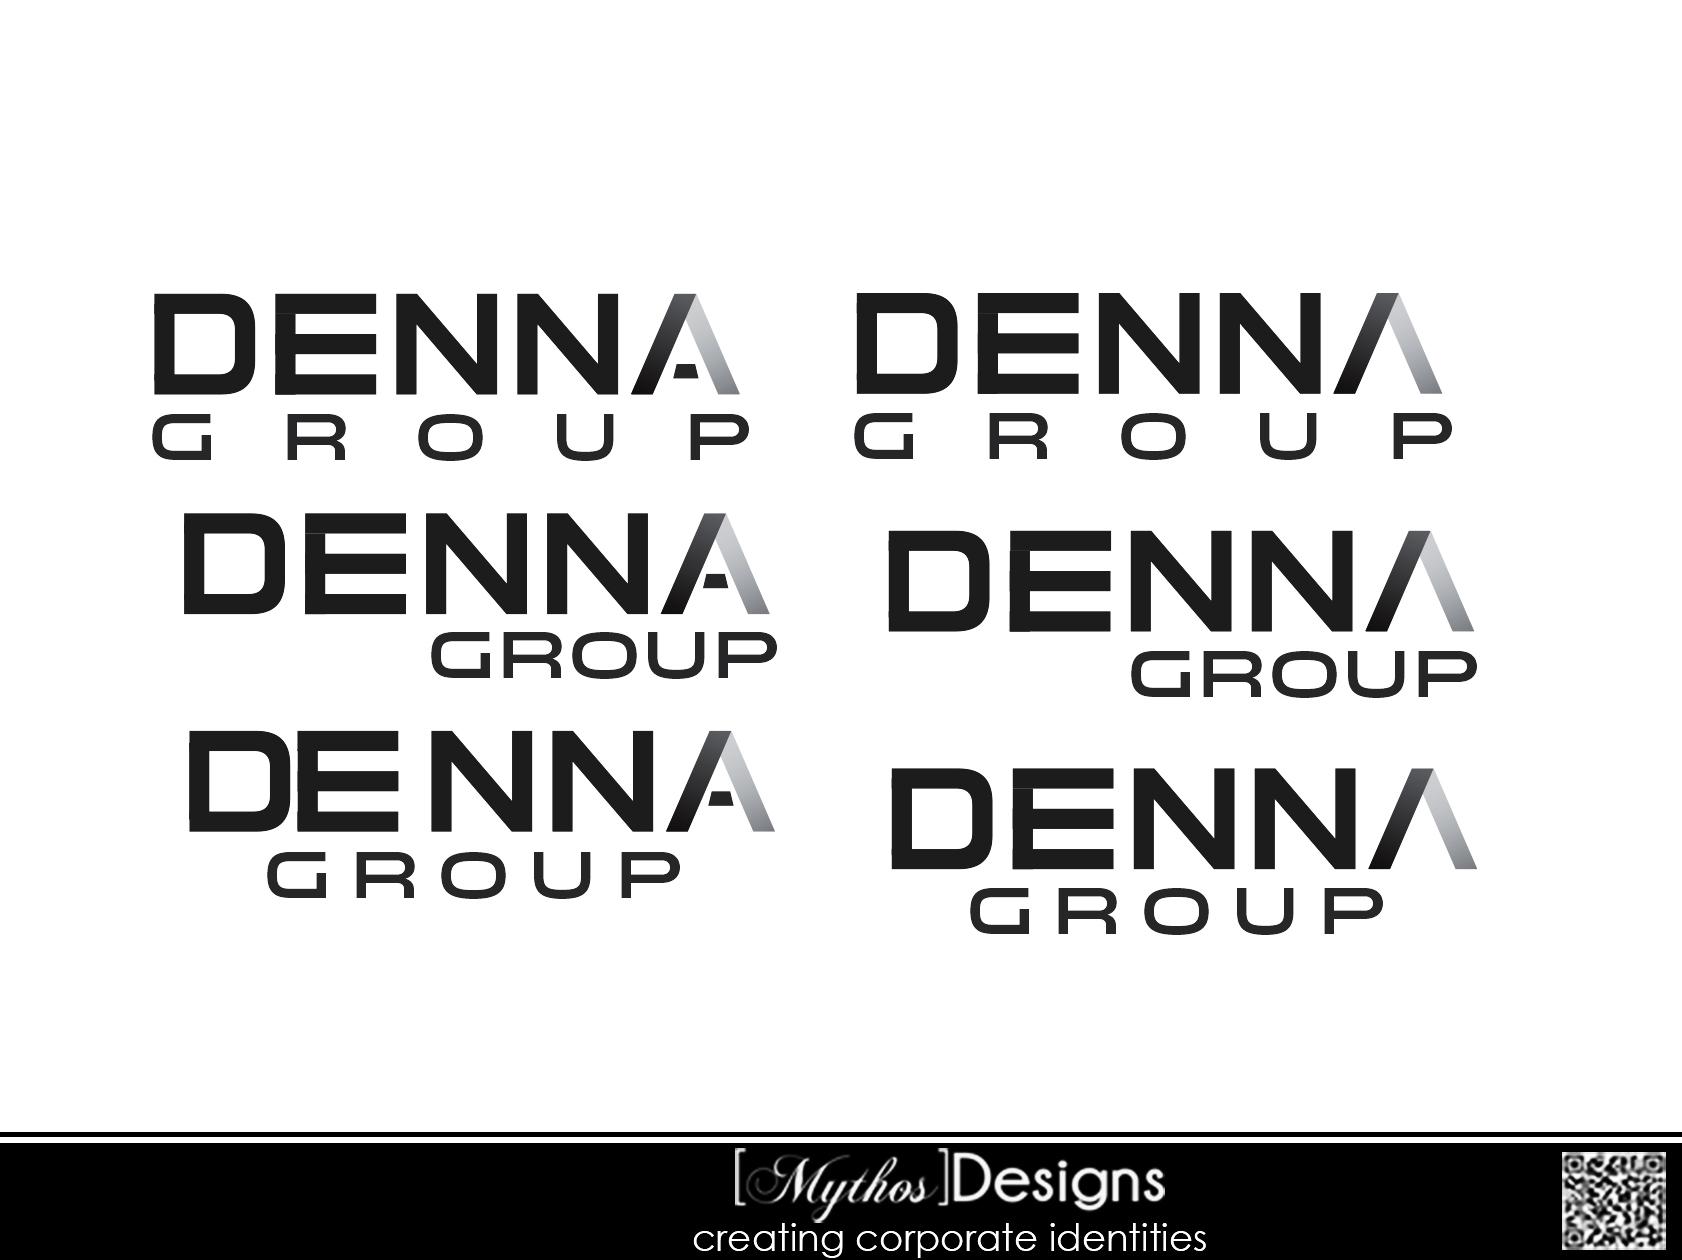 Logo Design by Mythos Designs - Entry No. 159 in the Logo Design Contest Denna Group Logo Design.